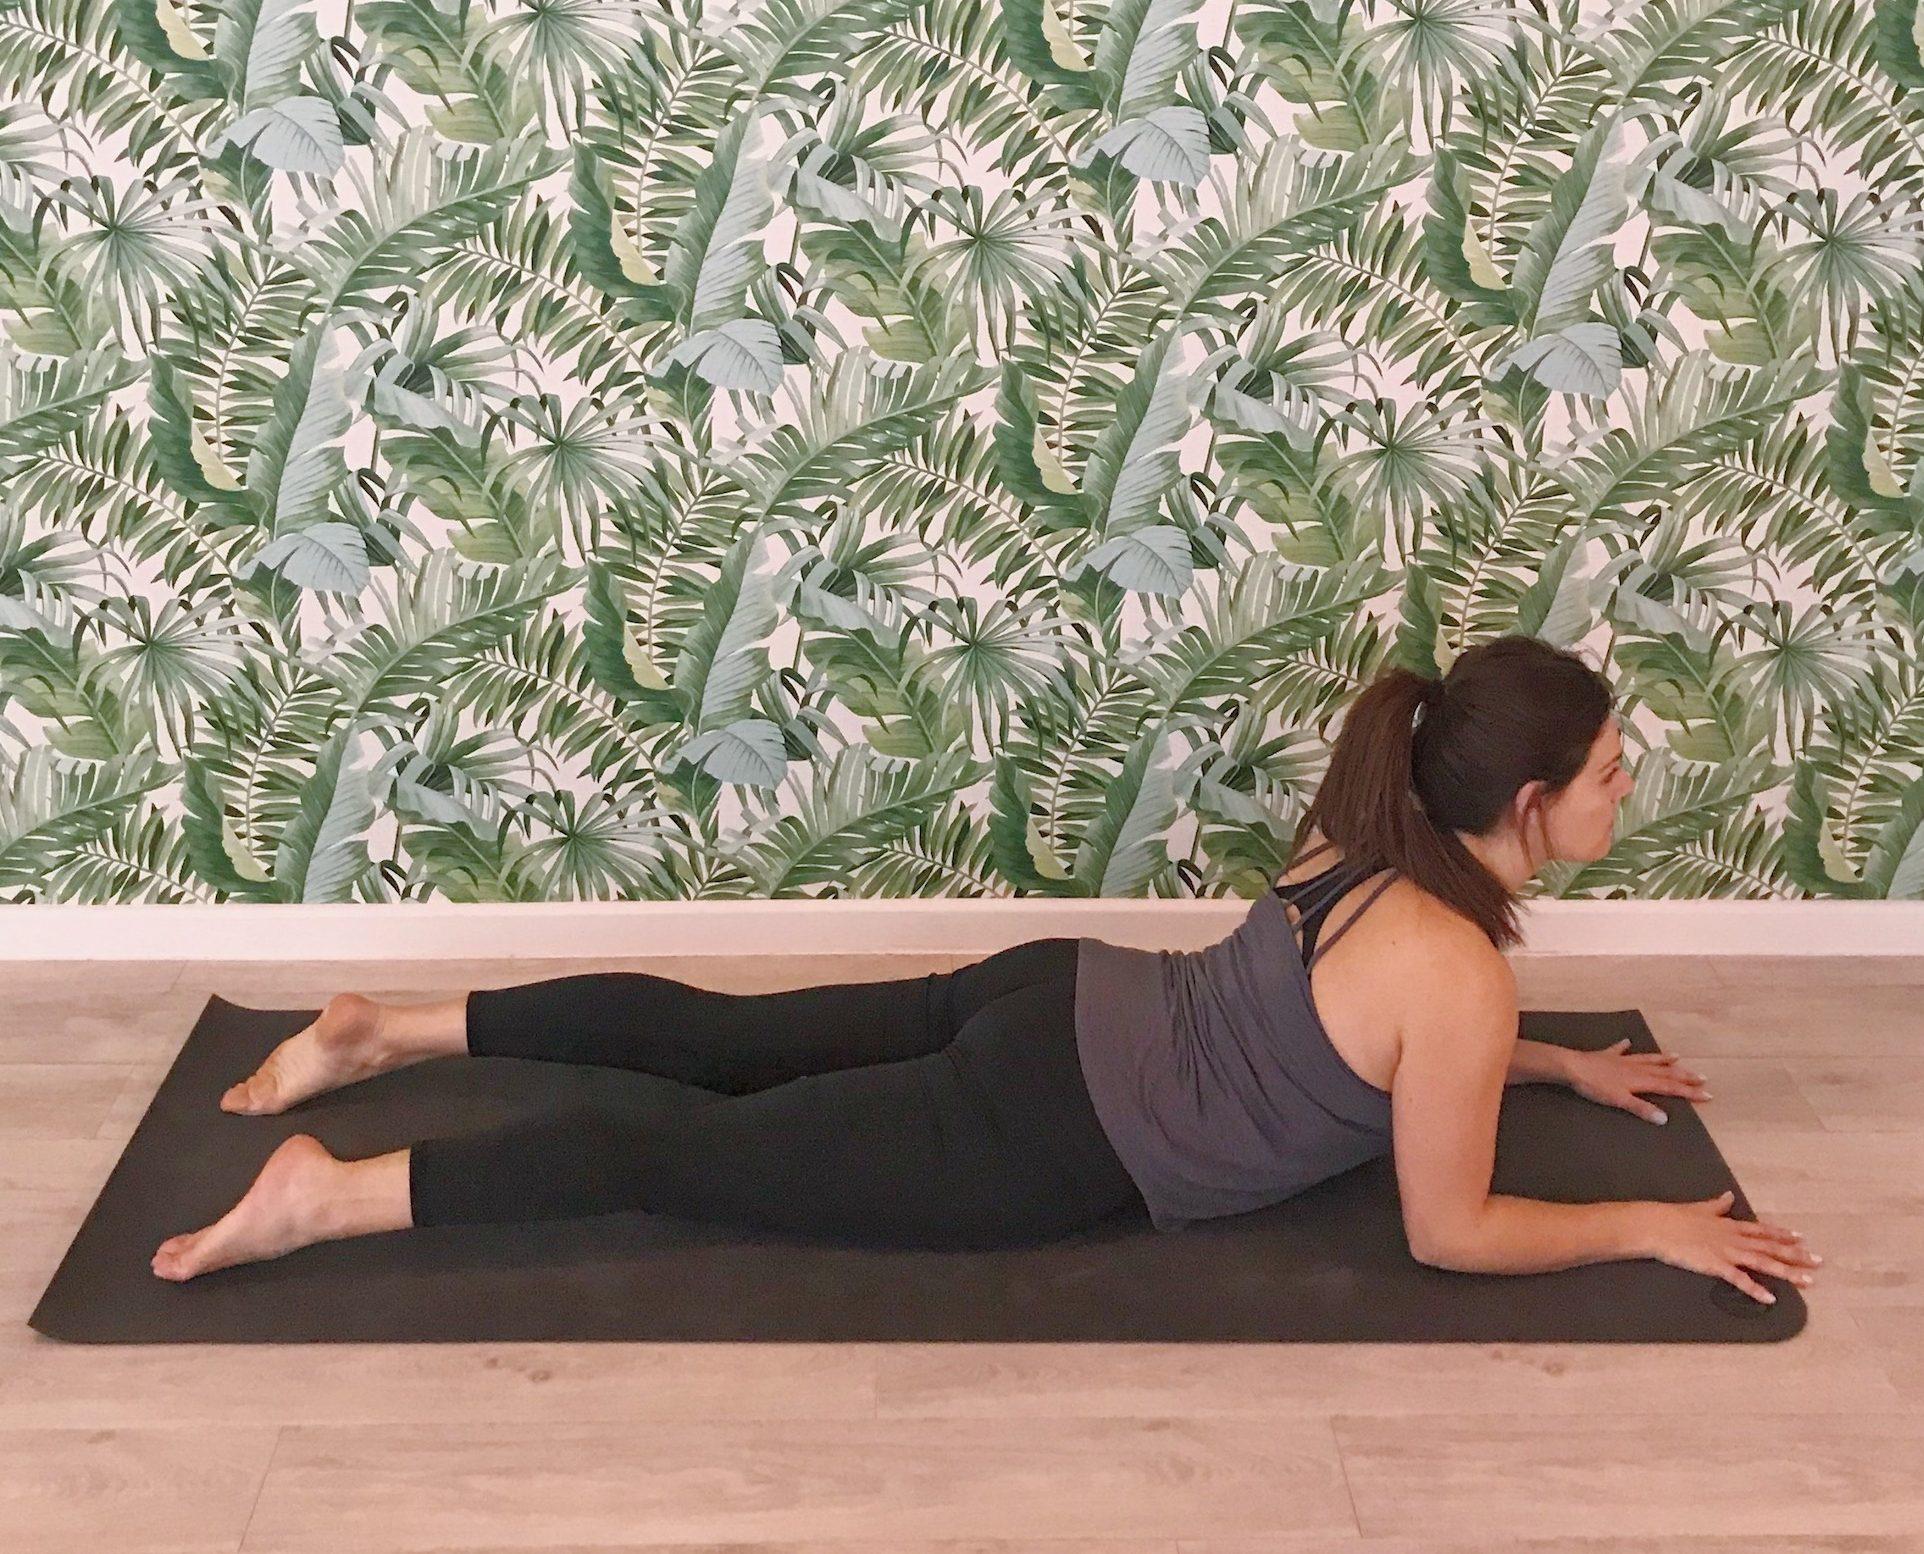 cobra pose 2 variation